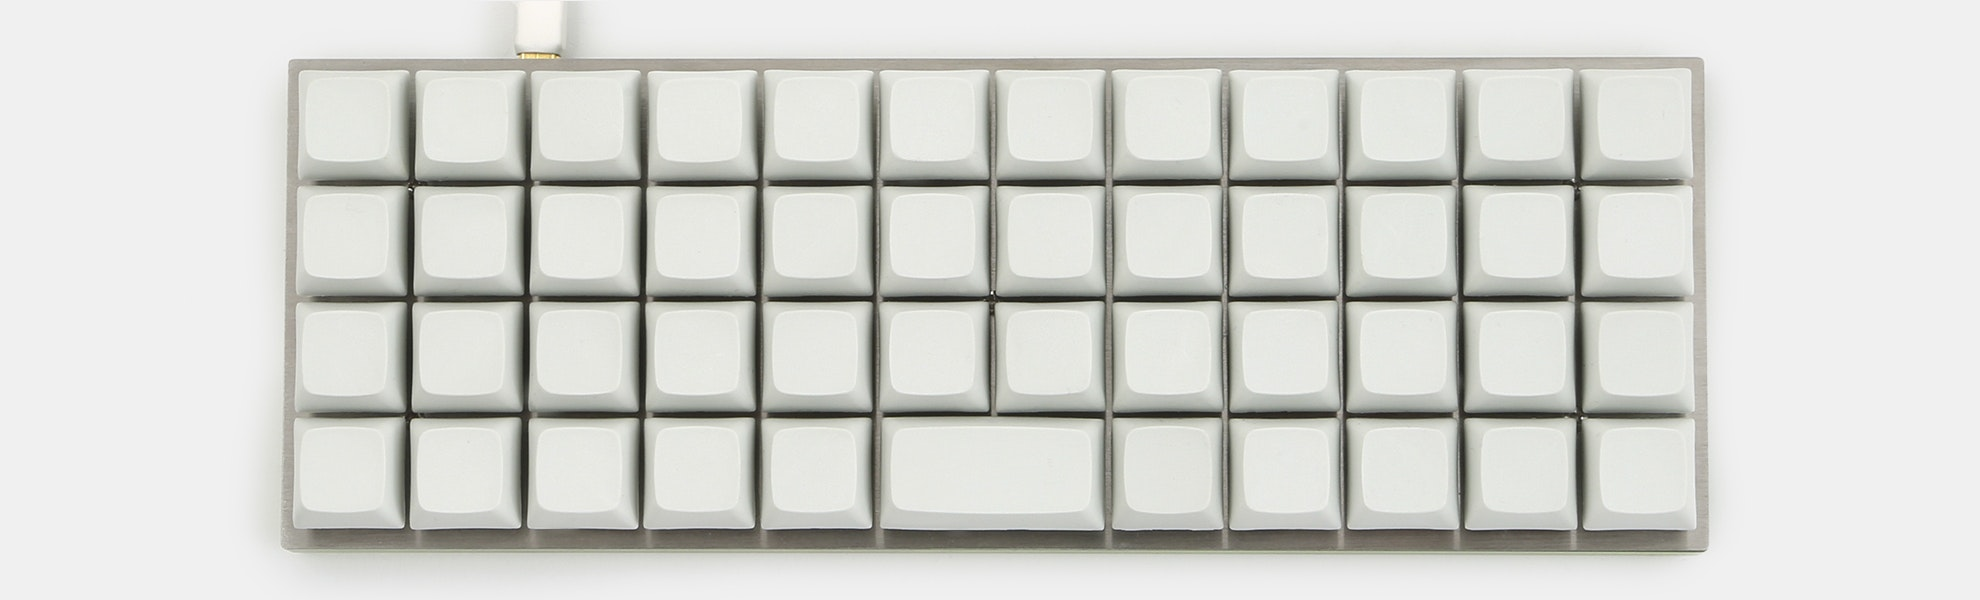 Massdrop x OLKB Planck Mechanical Keyboard Kit